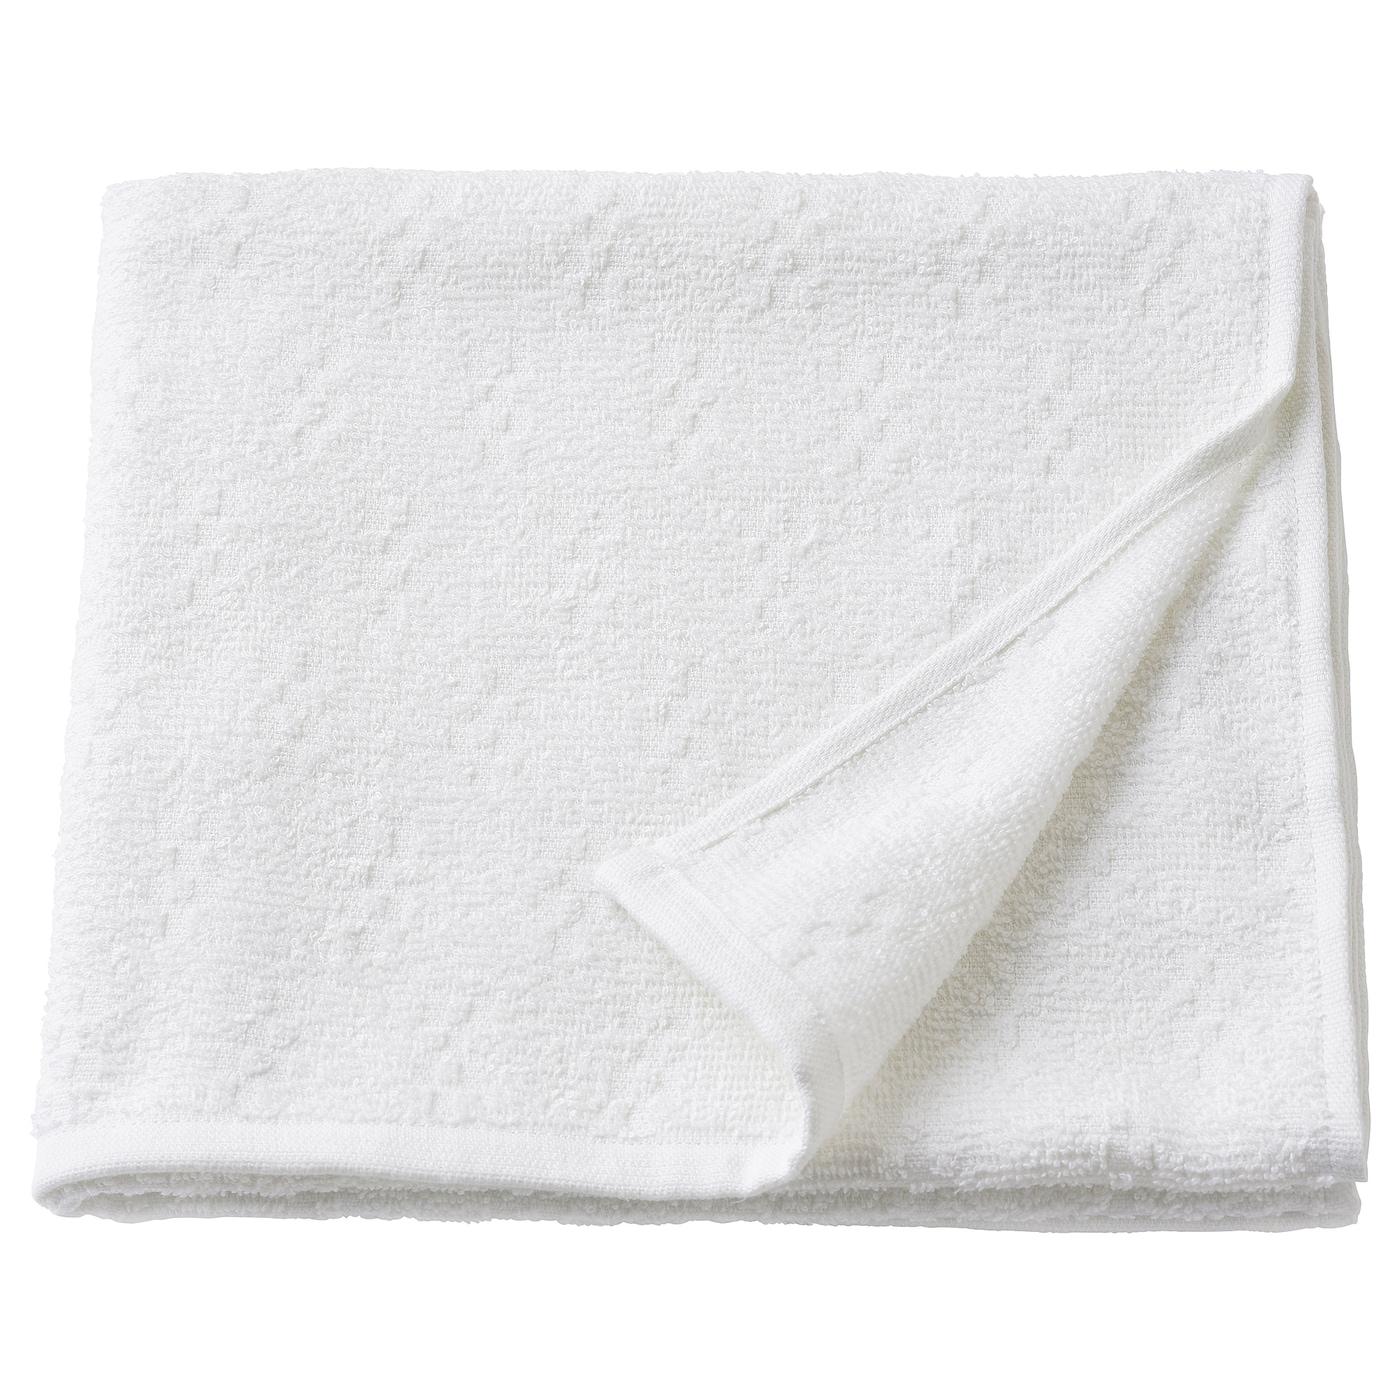 NÄRSEN Bath towel, white, 55x120 cm - IKEA